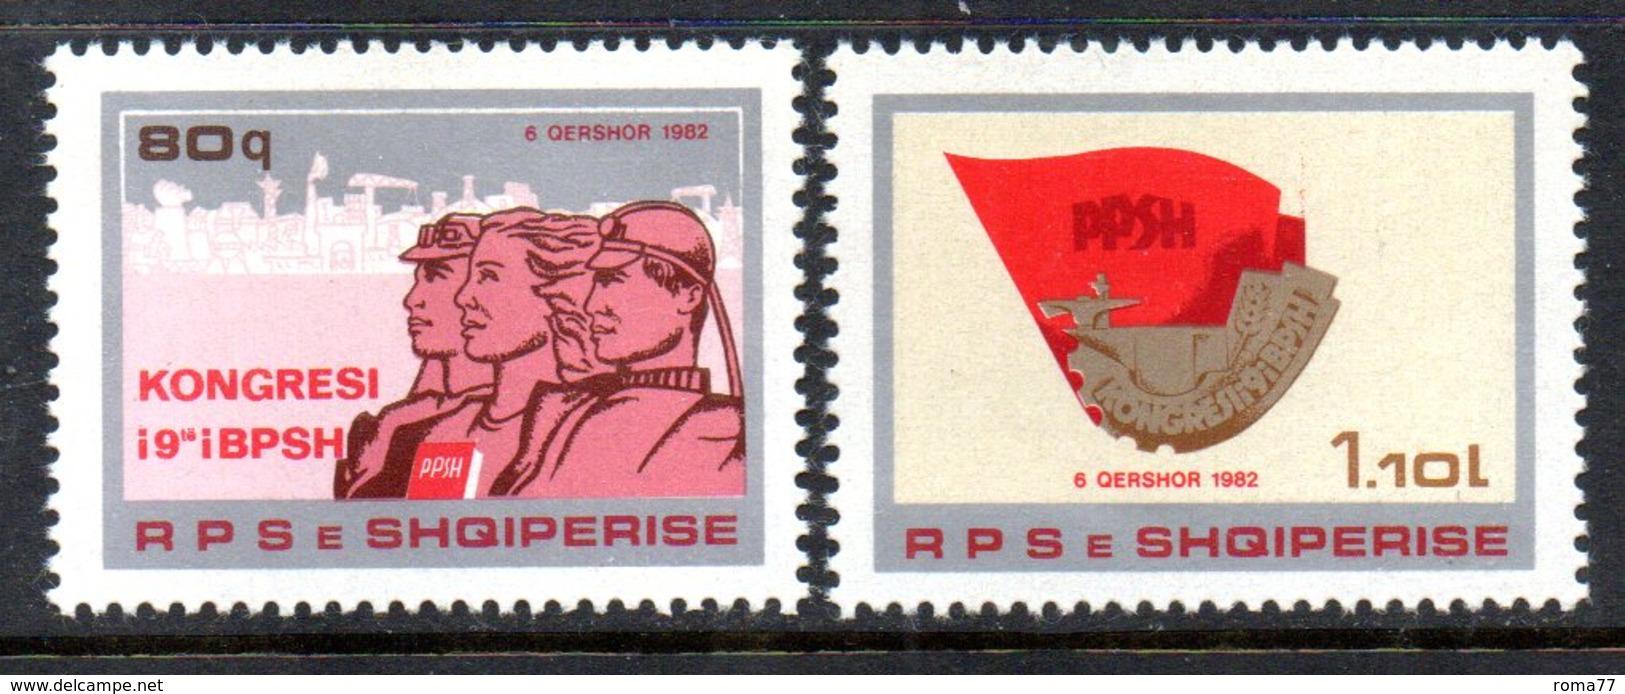 XP3982 - ALBANIA 1982 , Yvert Serie N. 1940/1941  ***  Sindacato - Albania